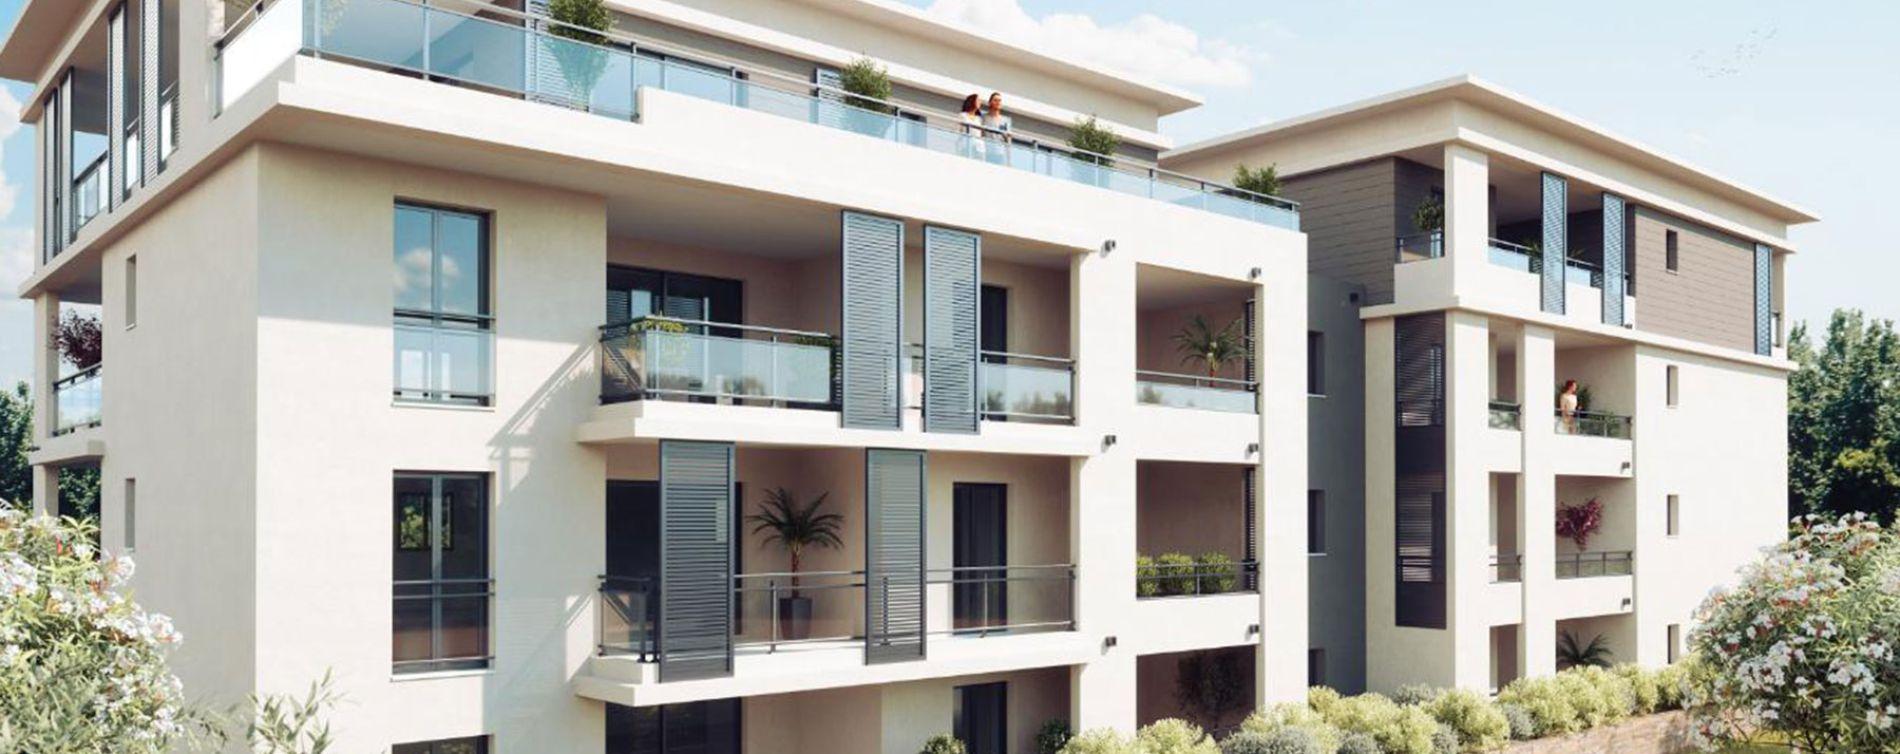 Porto-Vecchio : programme immobilier neuve « Vignola 2 » en Loi Pinel